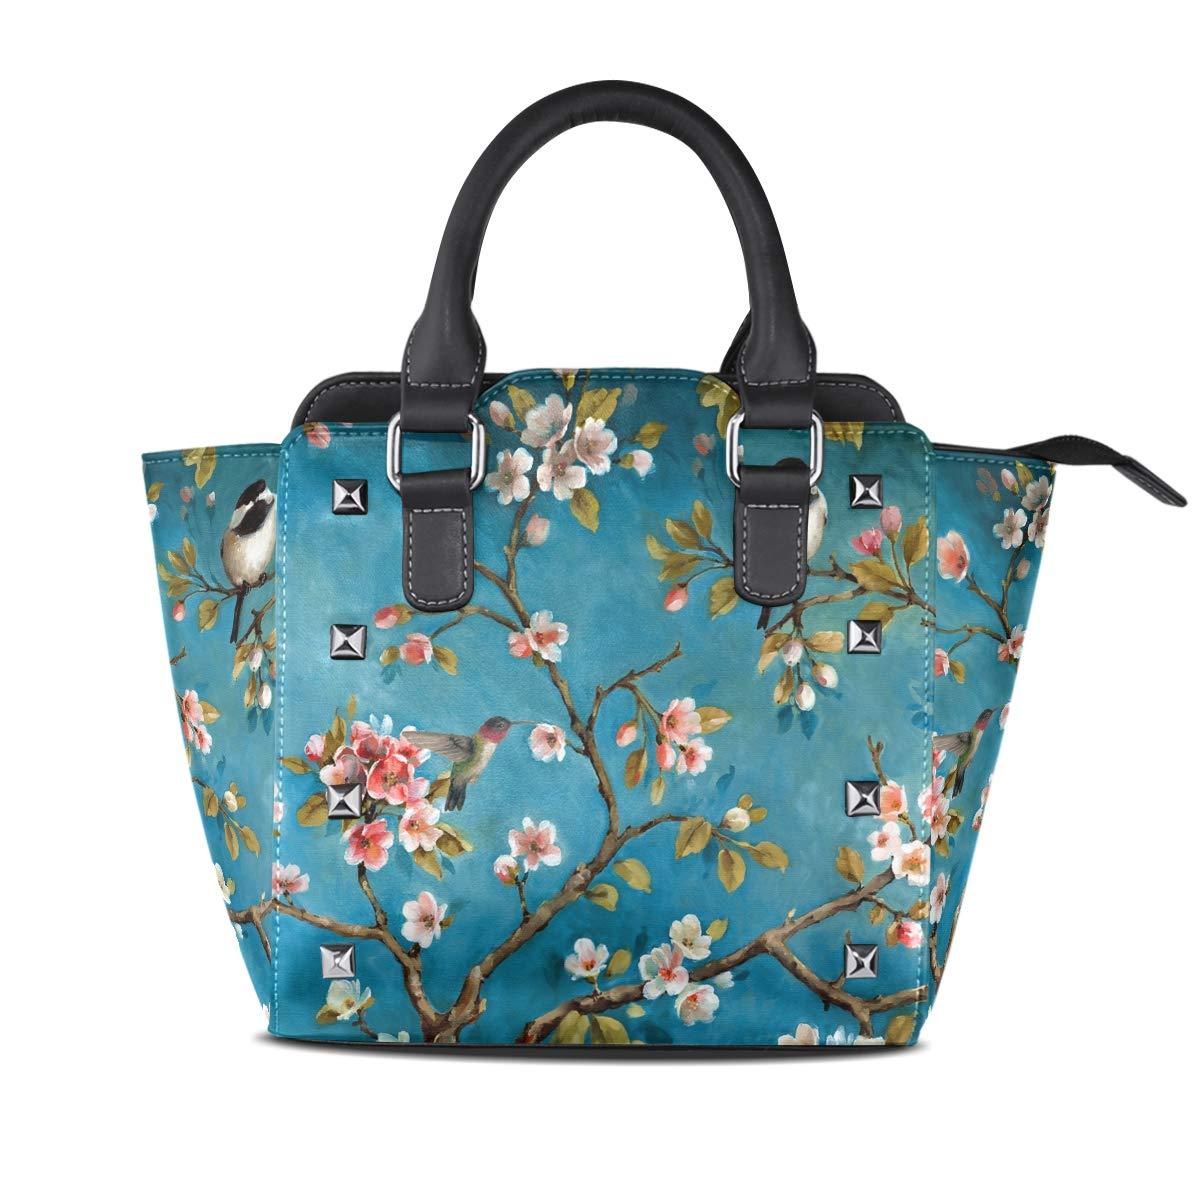 Design1 Bird On The Branch Top Handle Satchel Handbags Leather Tote Adjustable Shoulder Rivet Bag for Women